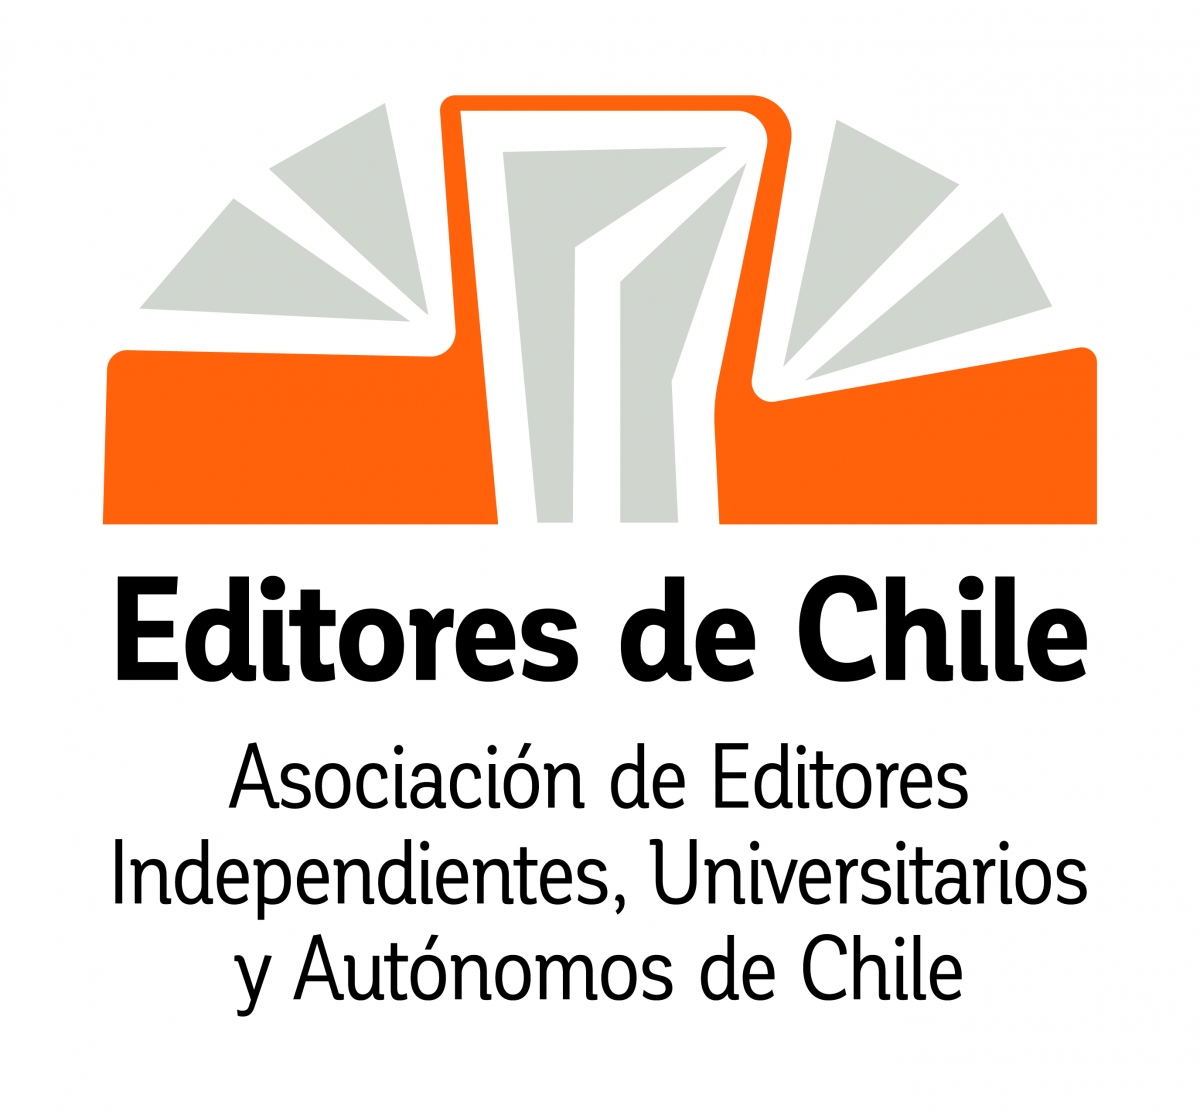 editores de chile logo